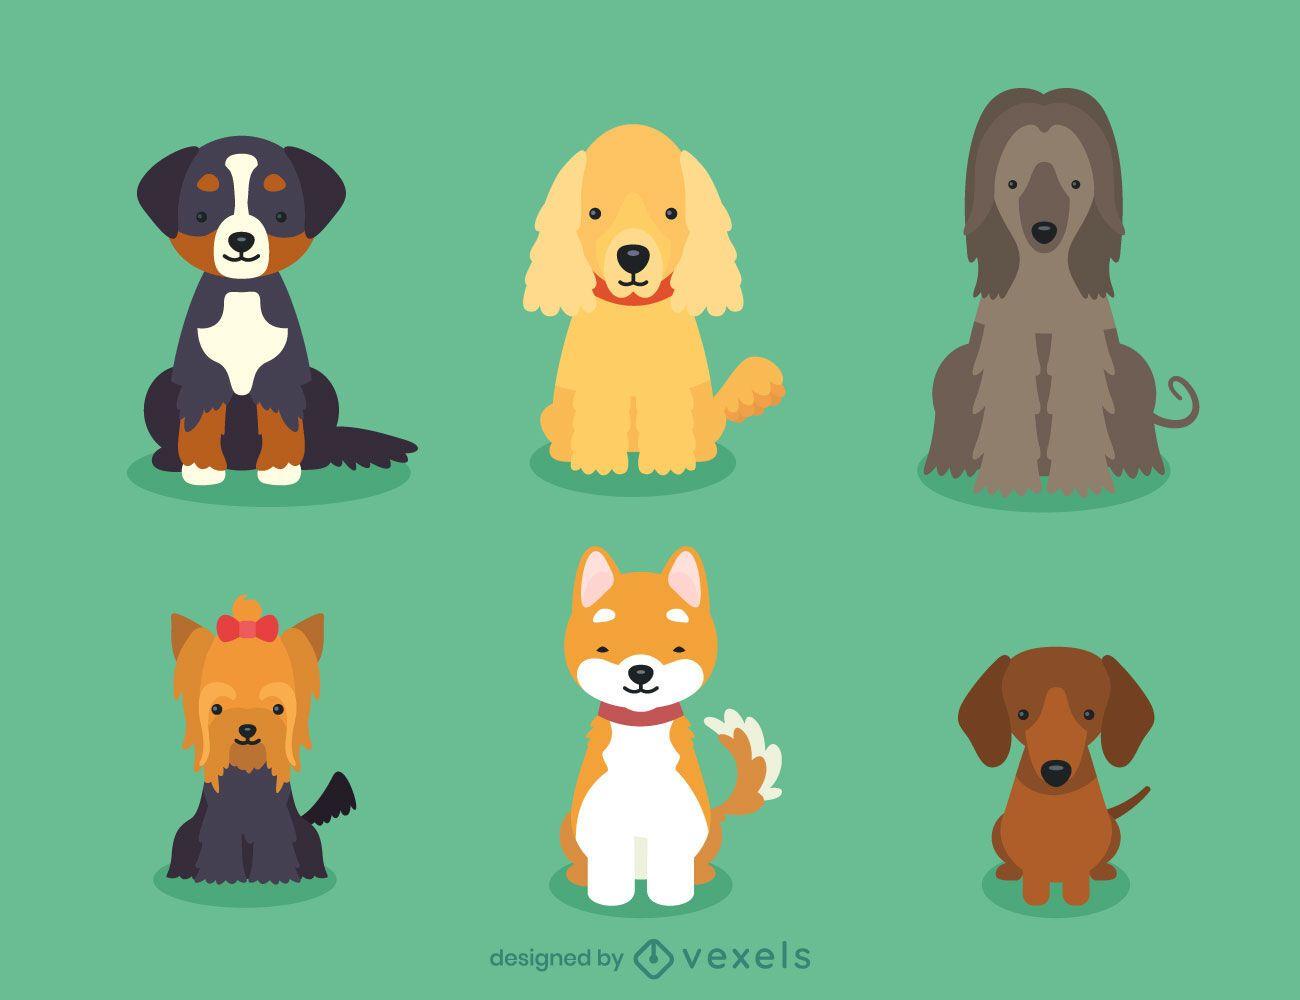 Dog breed puppies illustration set